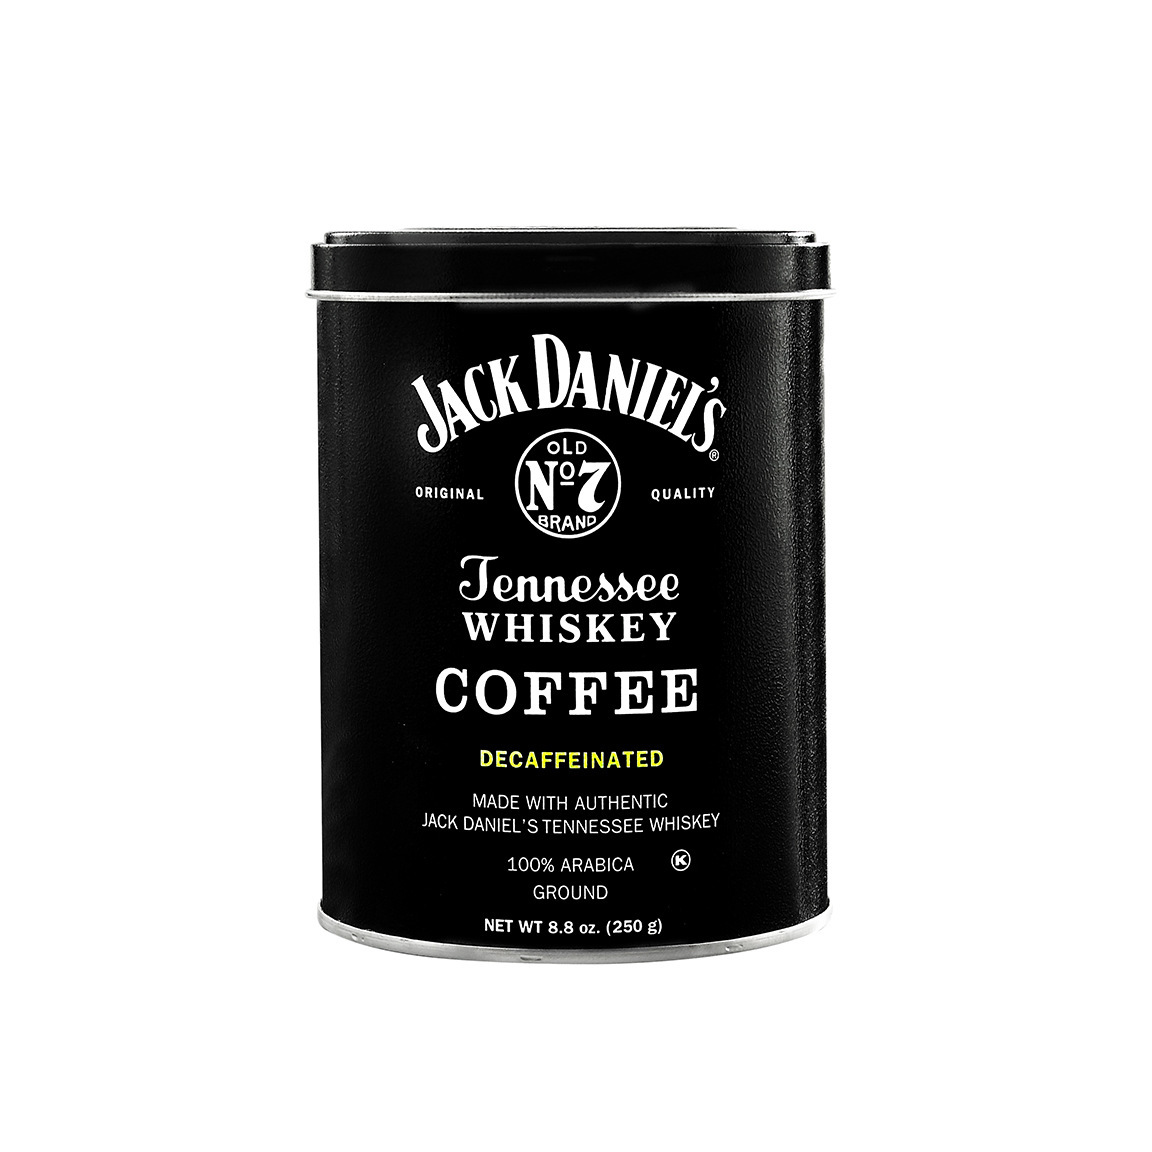 Green mountain coffee pumpkin spice caffeine